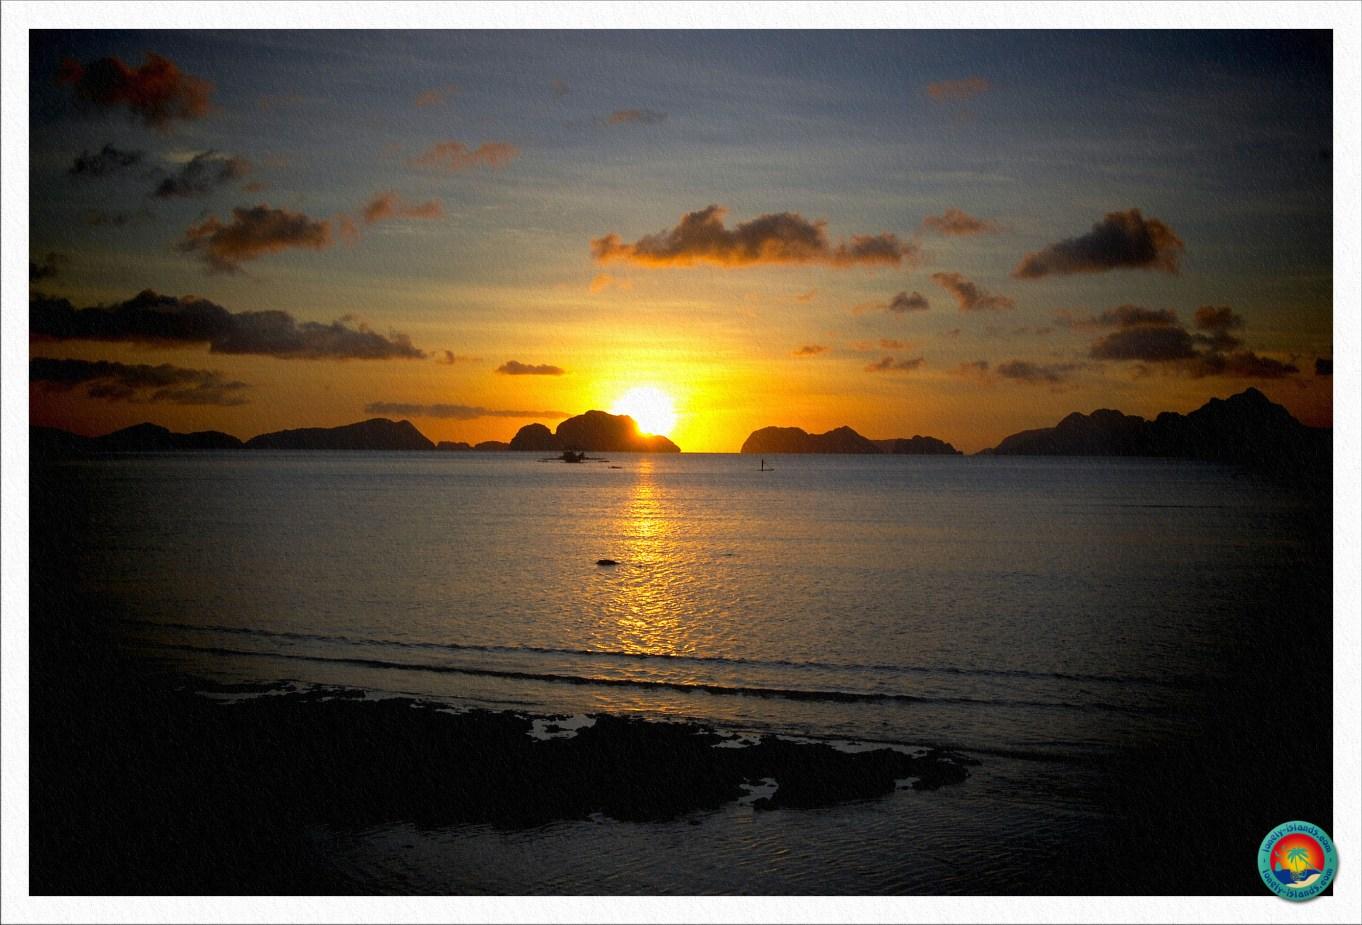 Sonnenuntergang vom Corong Corong Beach in El Nido